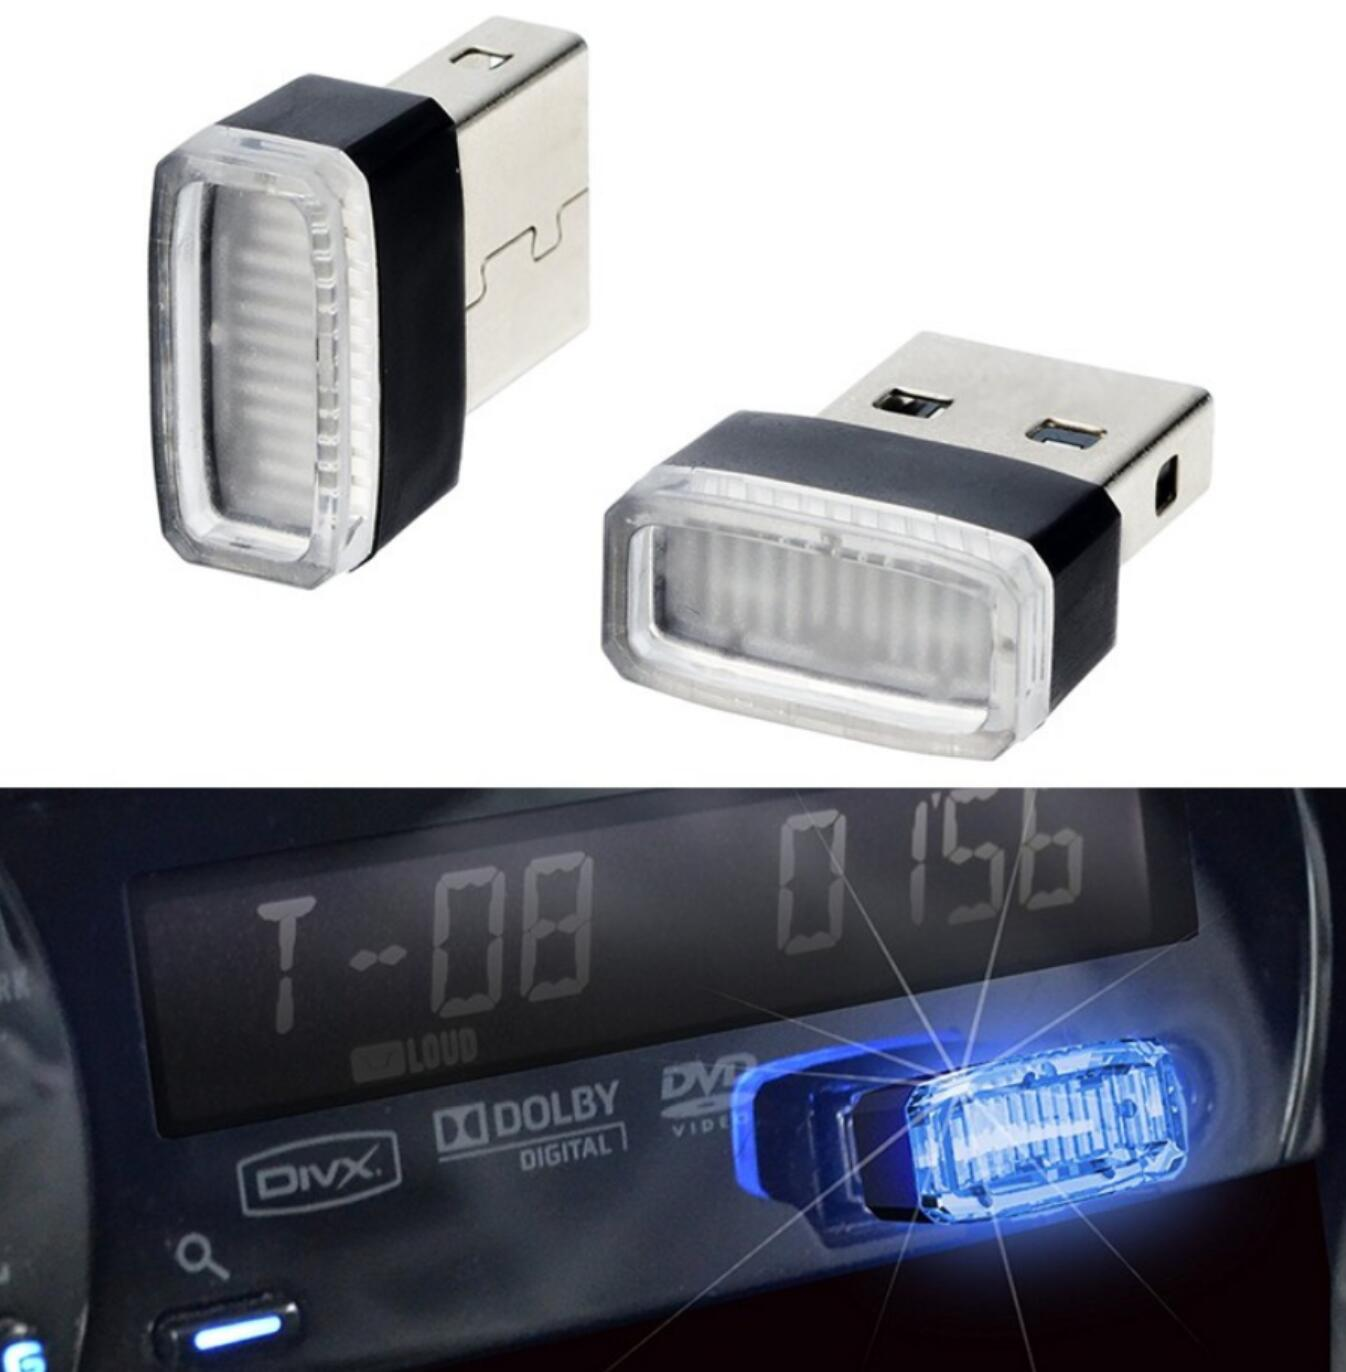 Interior Accessories Automotive Interior Stickers Diligent Car-styling Usb Led Atmosphere Lights Decorative Lamp For Citroen Picasso C1 C2 C3 C4 C4l C5 Ds3 Ds4 Ds5 Ds6 Elysee C-quatre Strengthening Waist And Sinews